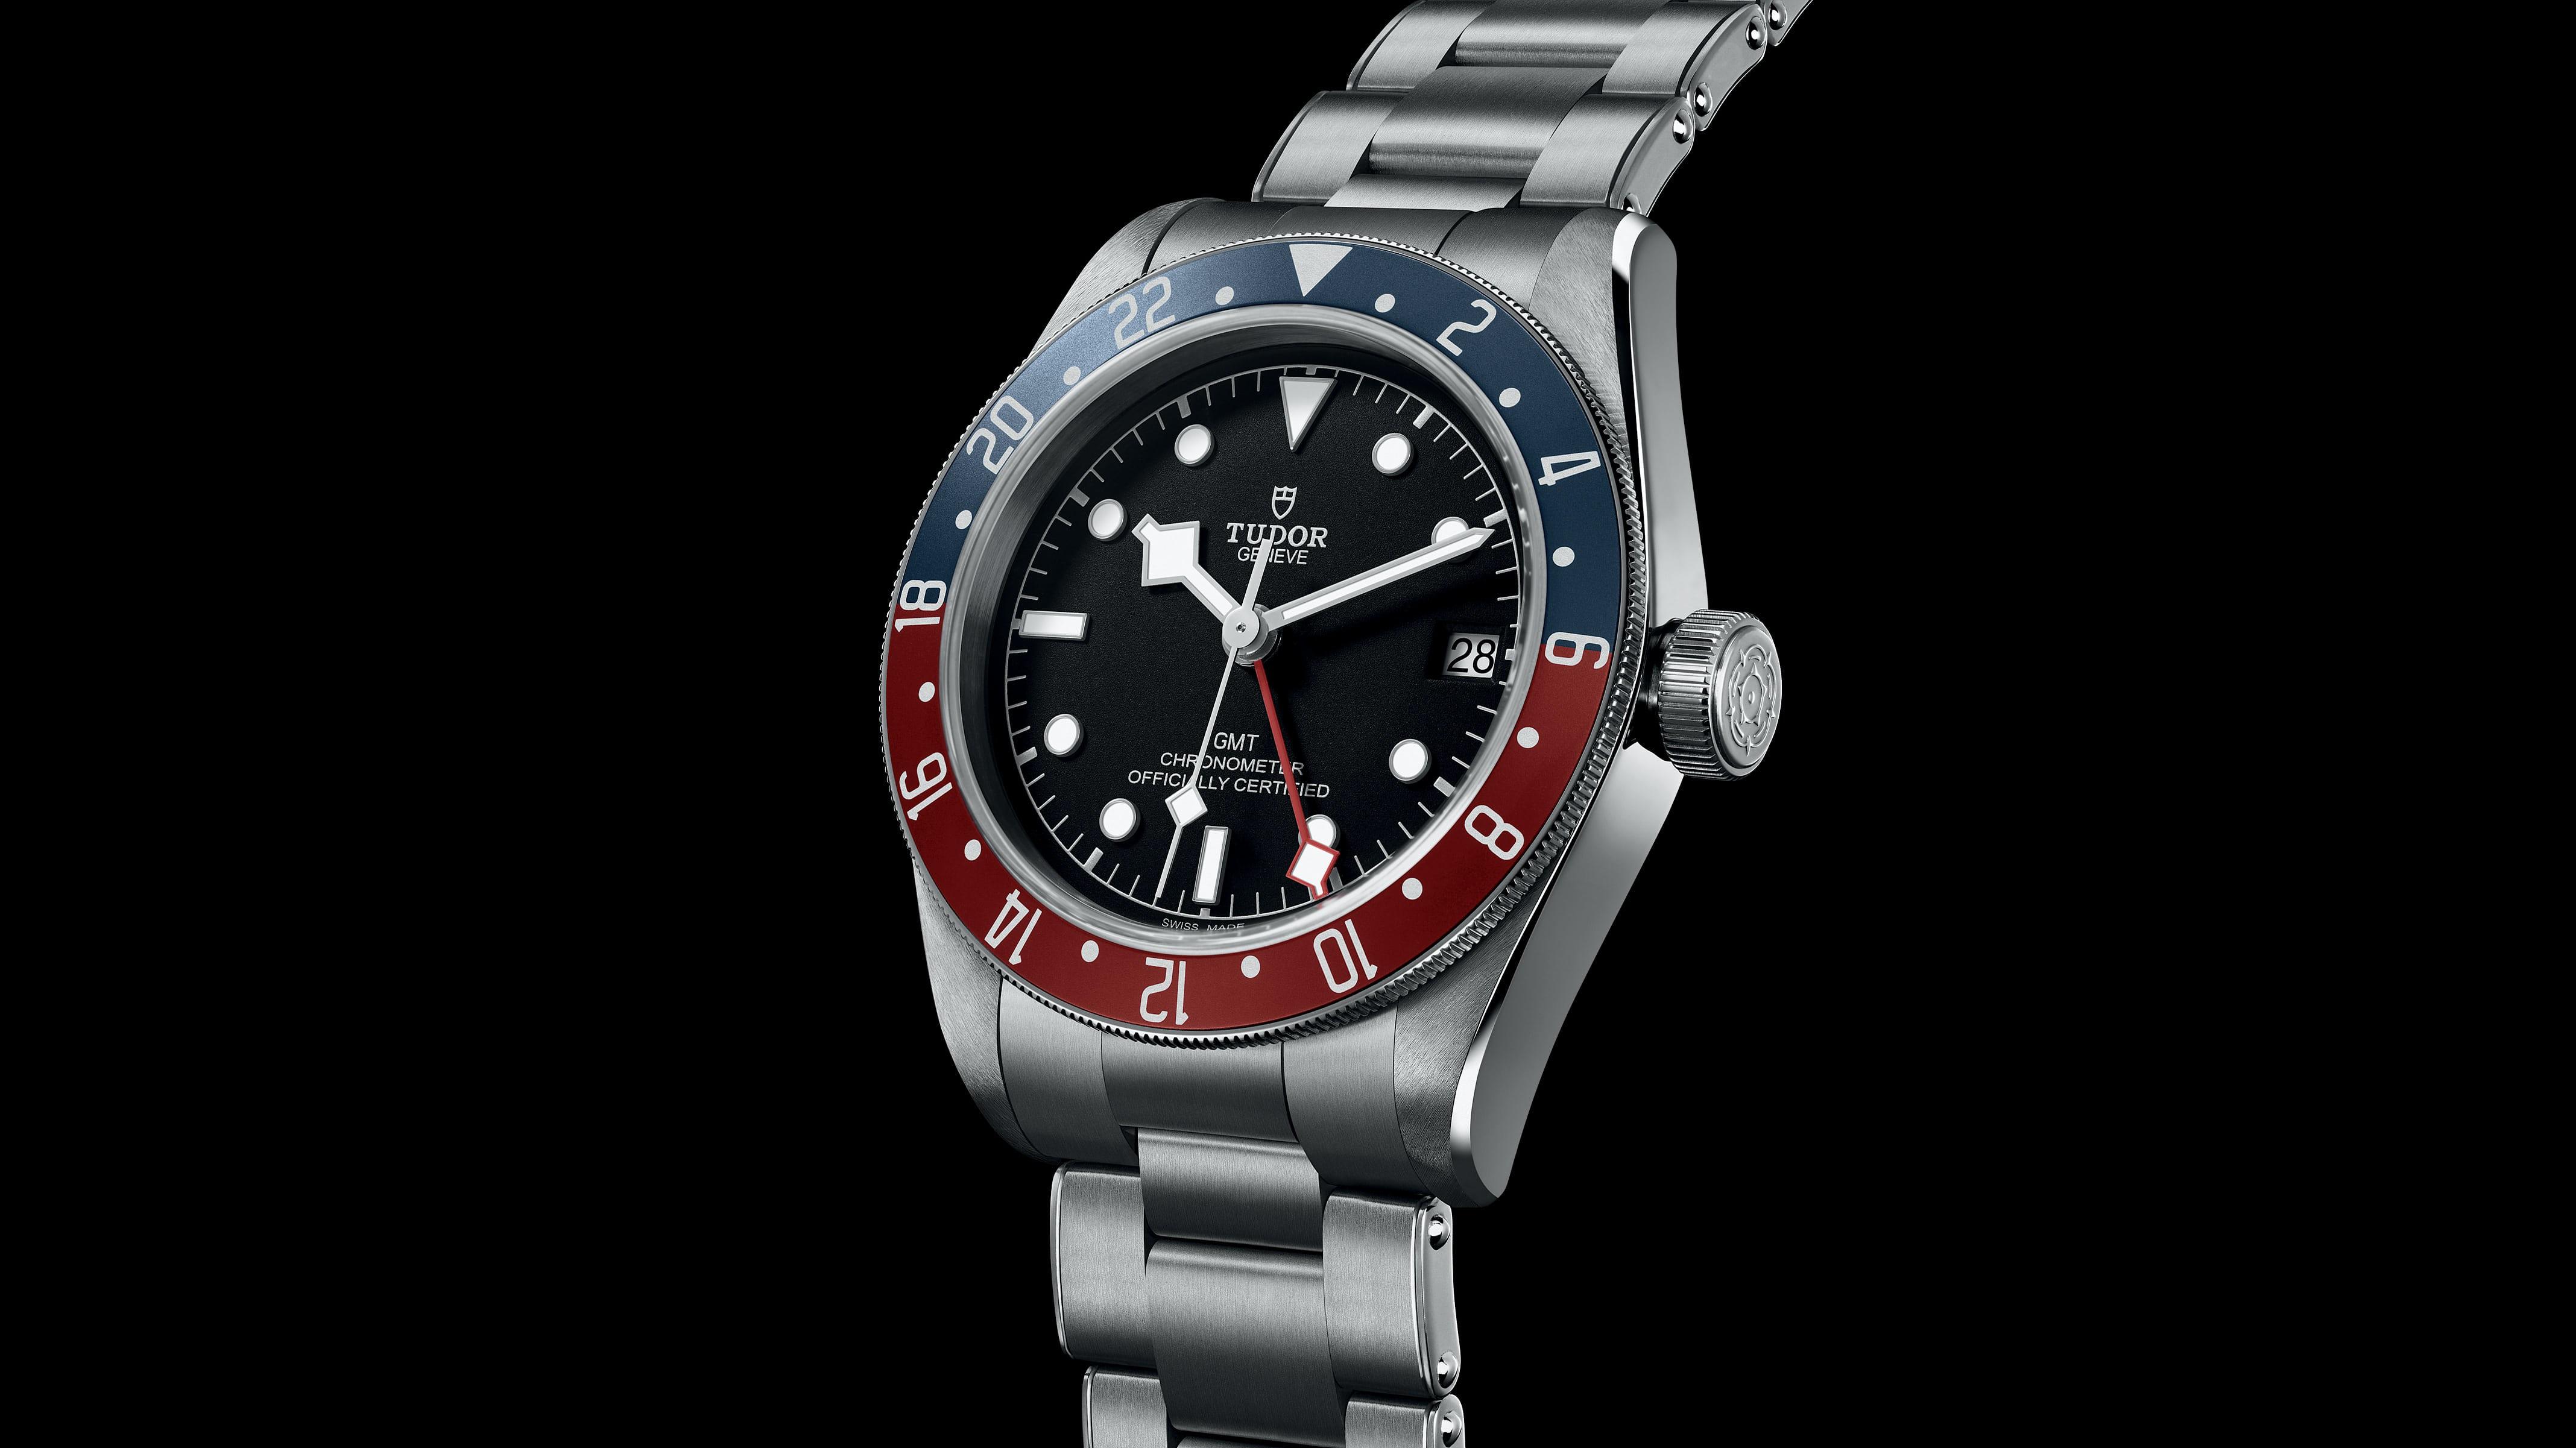 d1b381642e8 Introducing  The Tudor Black Bay GMT - HODINKEE